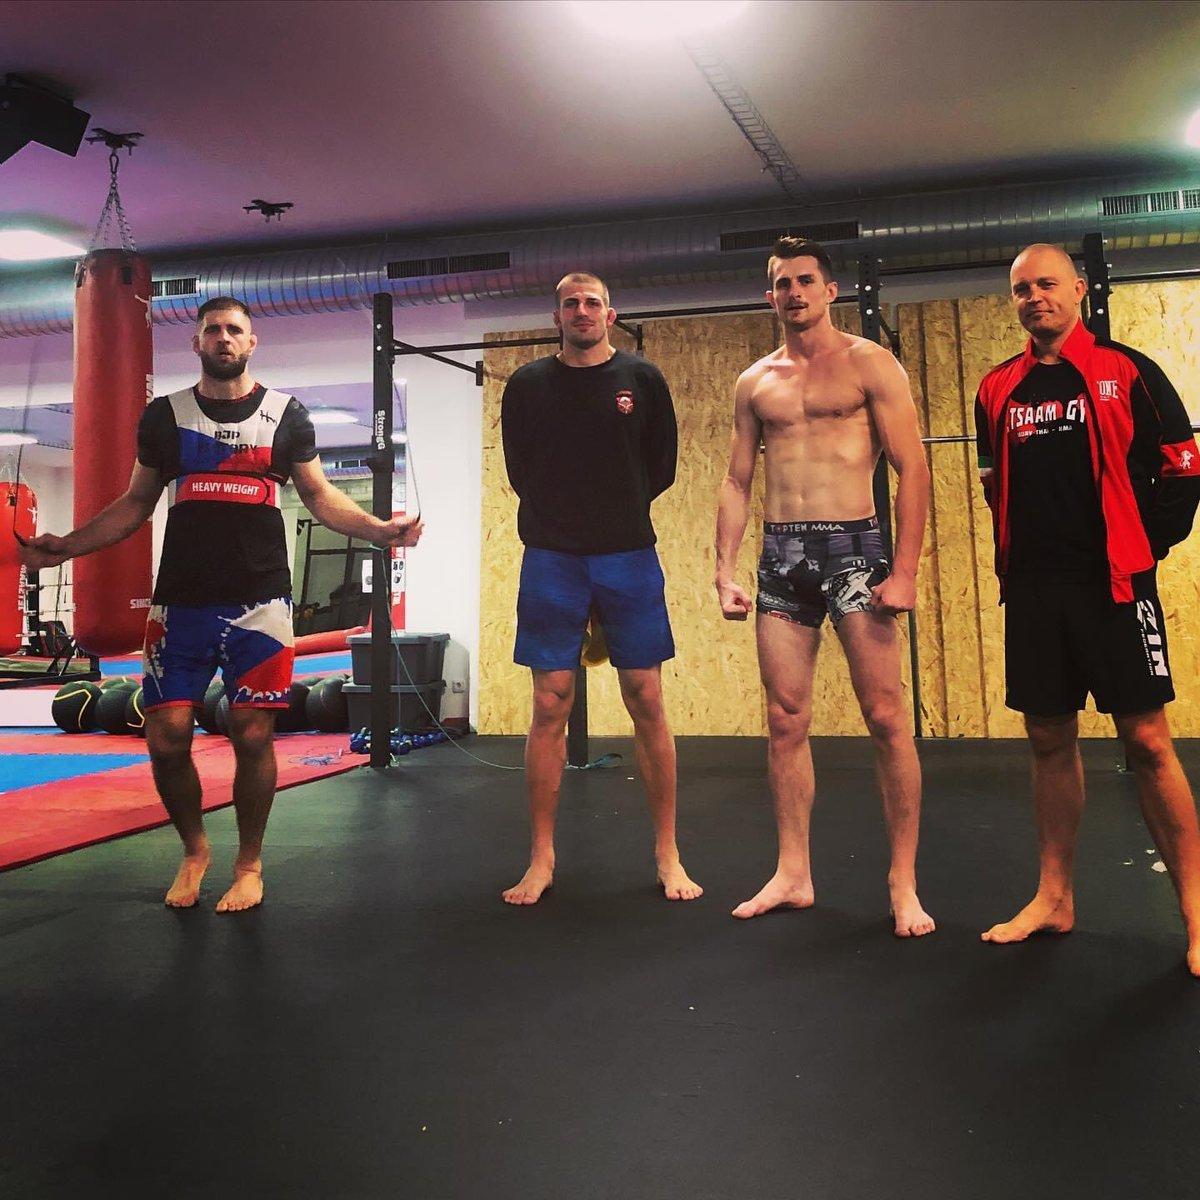 Dnesni trenink profesionalnich sportovcu. @jiri_bjp  a Andrej Kalasnik v priprave na zapasy, JayJay prvni trenink po navratu z nekolikatydenniho prijimace.  Vyzkouseno, ze sport prinasi radost a pozitivni naladu.  #jetsaamgym #jetsaam #mma #oktagonmma #ufc #bjp https://t.co/jSFlCSKkKJ